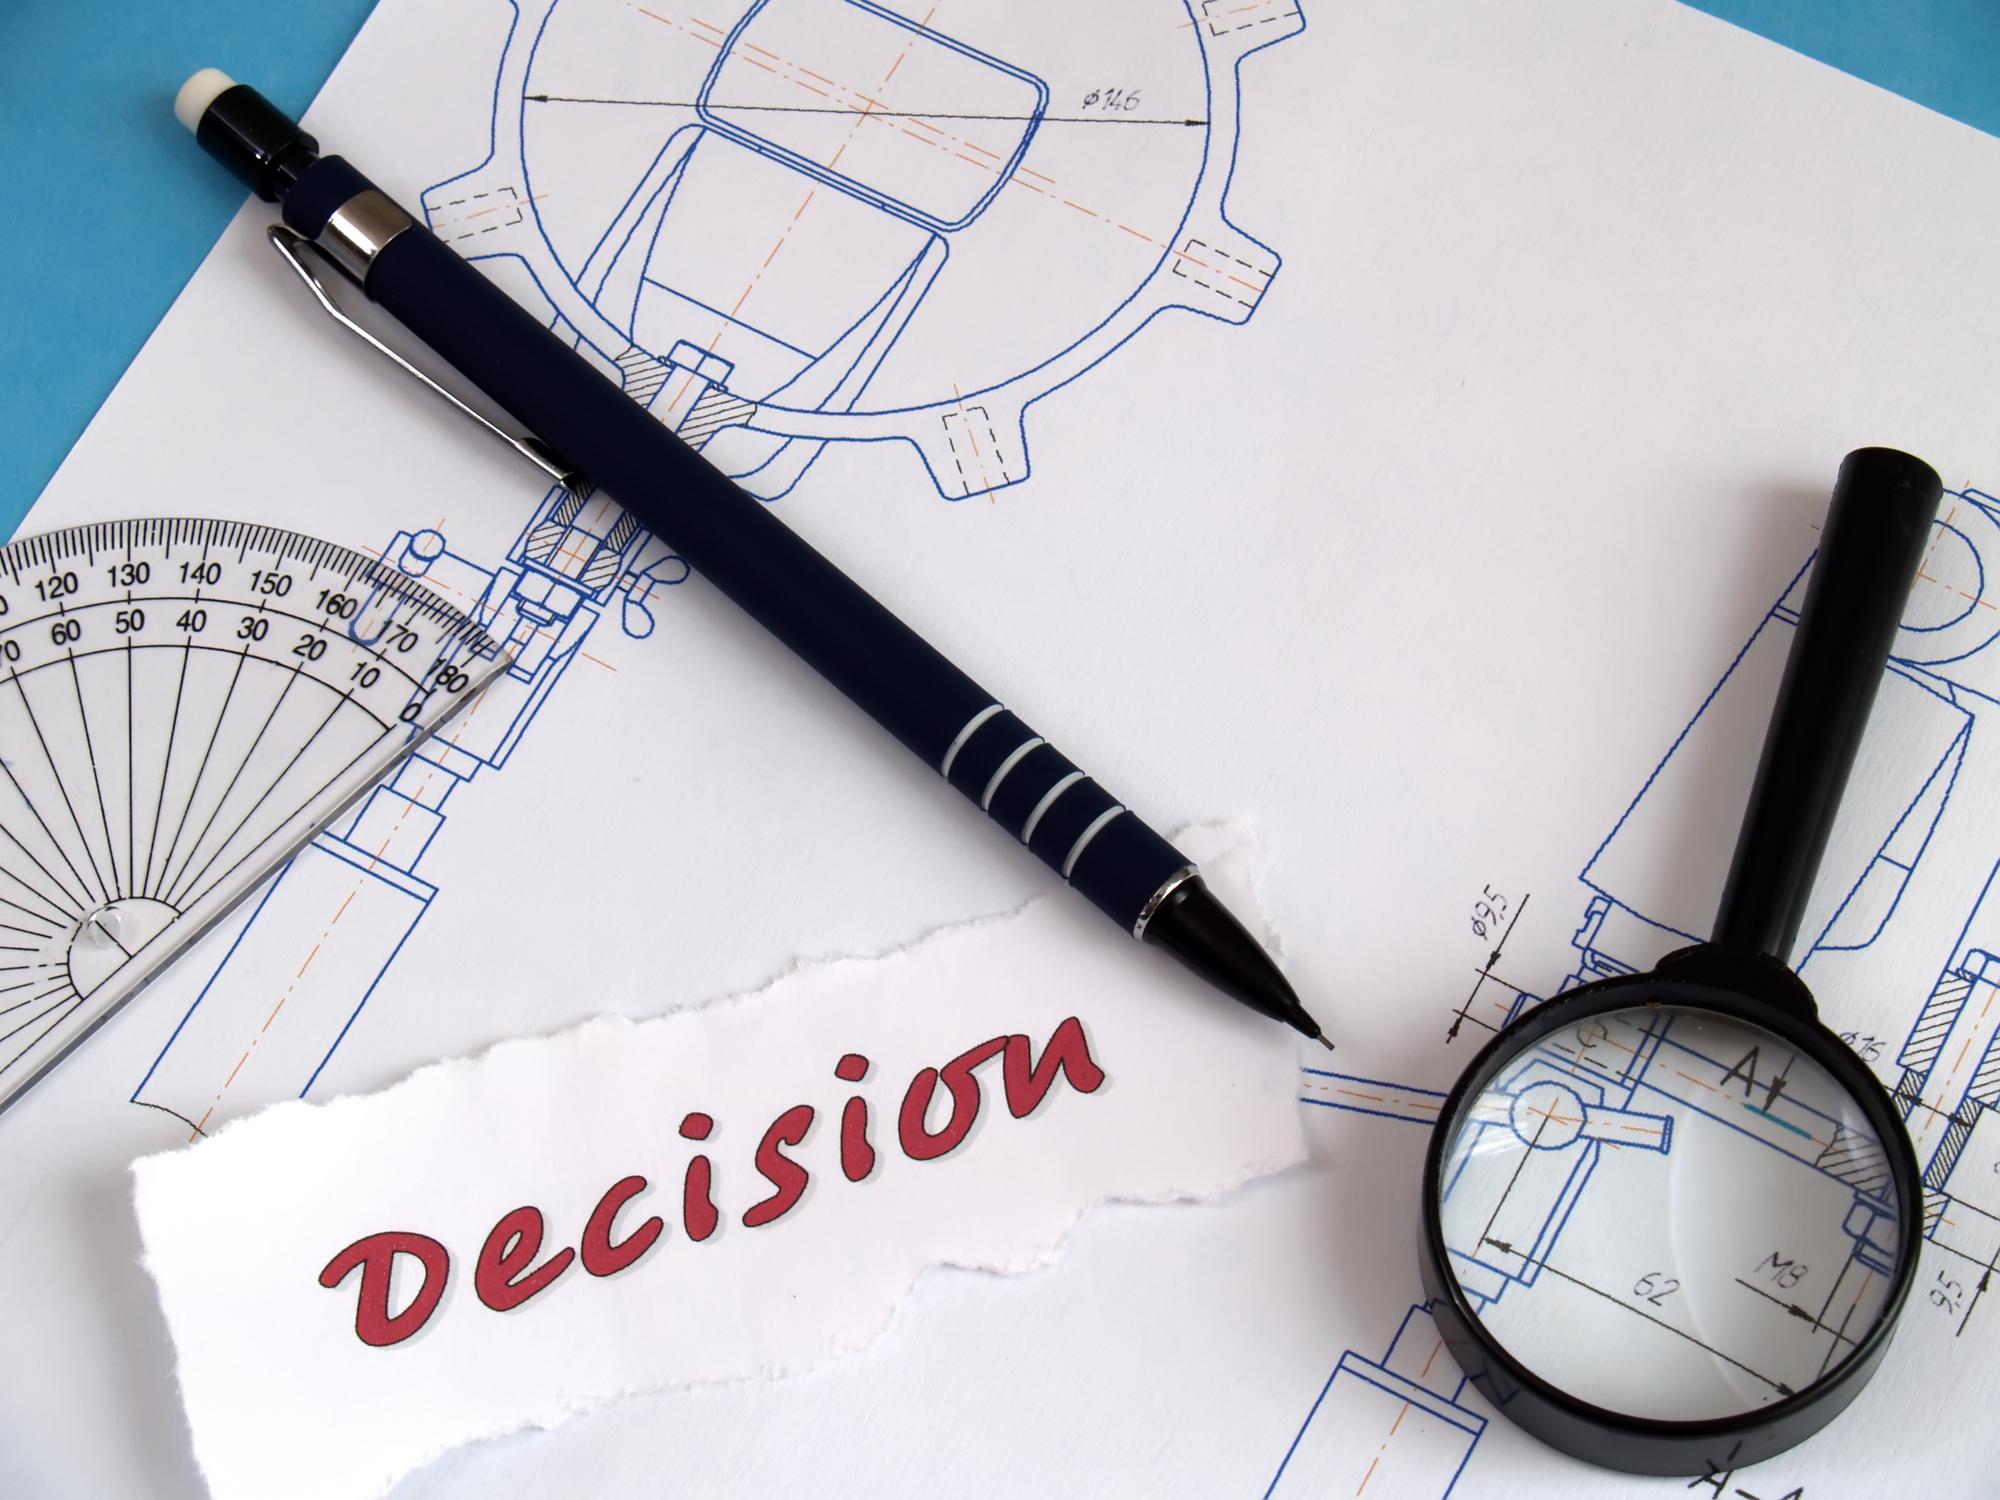 decision72135.jpg